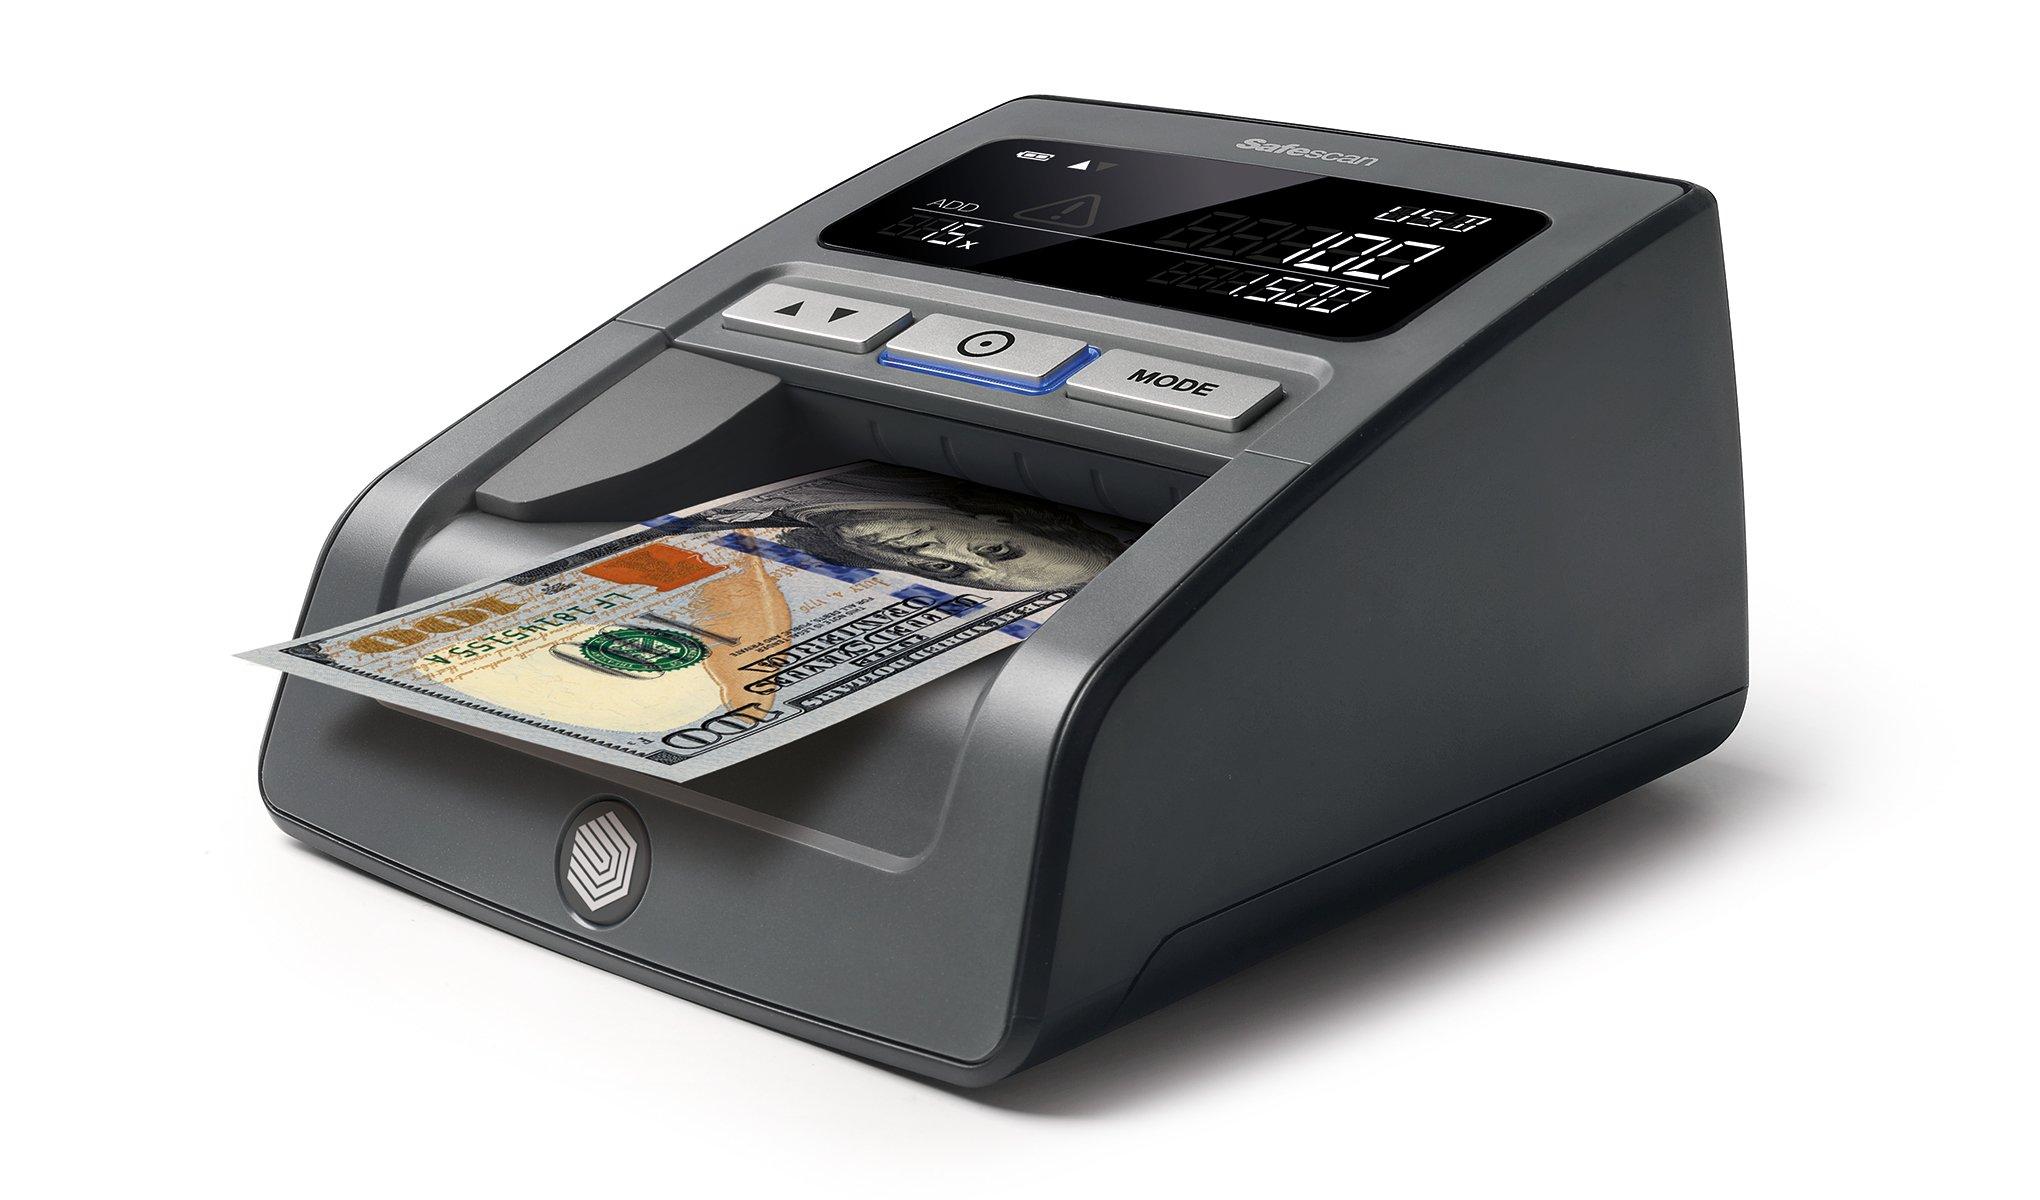 Safescan 185-S Black - Multi-Direction Automatic Counterfeit Detector